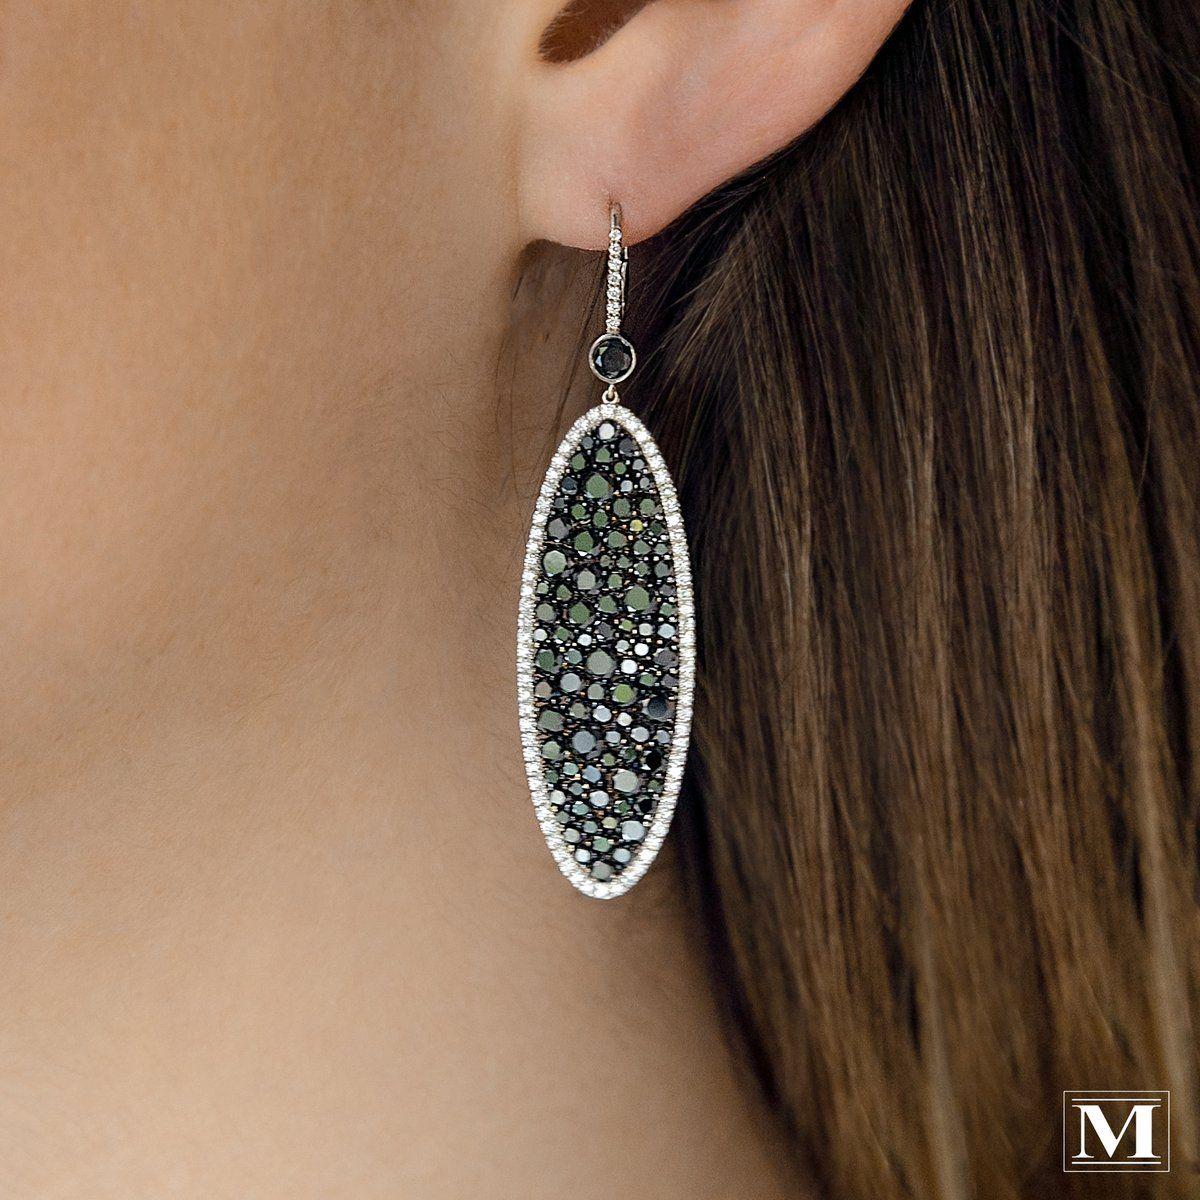 Martin Katz Black Diamond Earrings From The Champagne